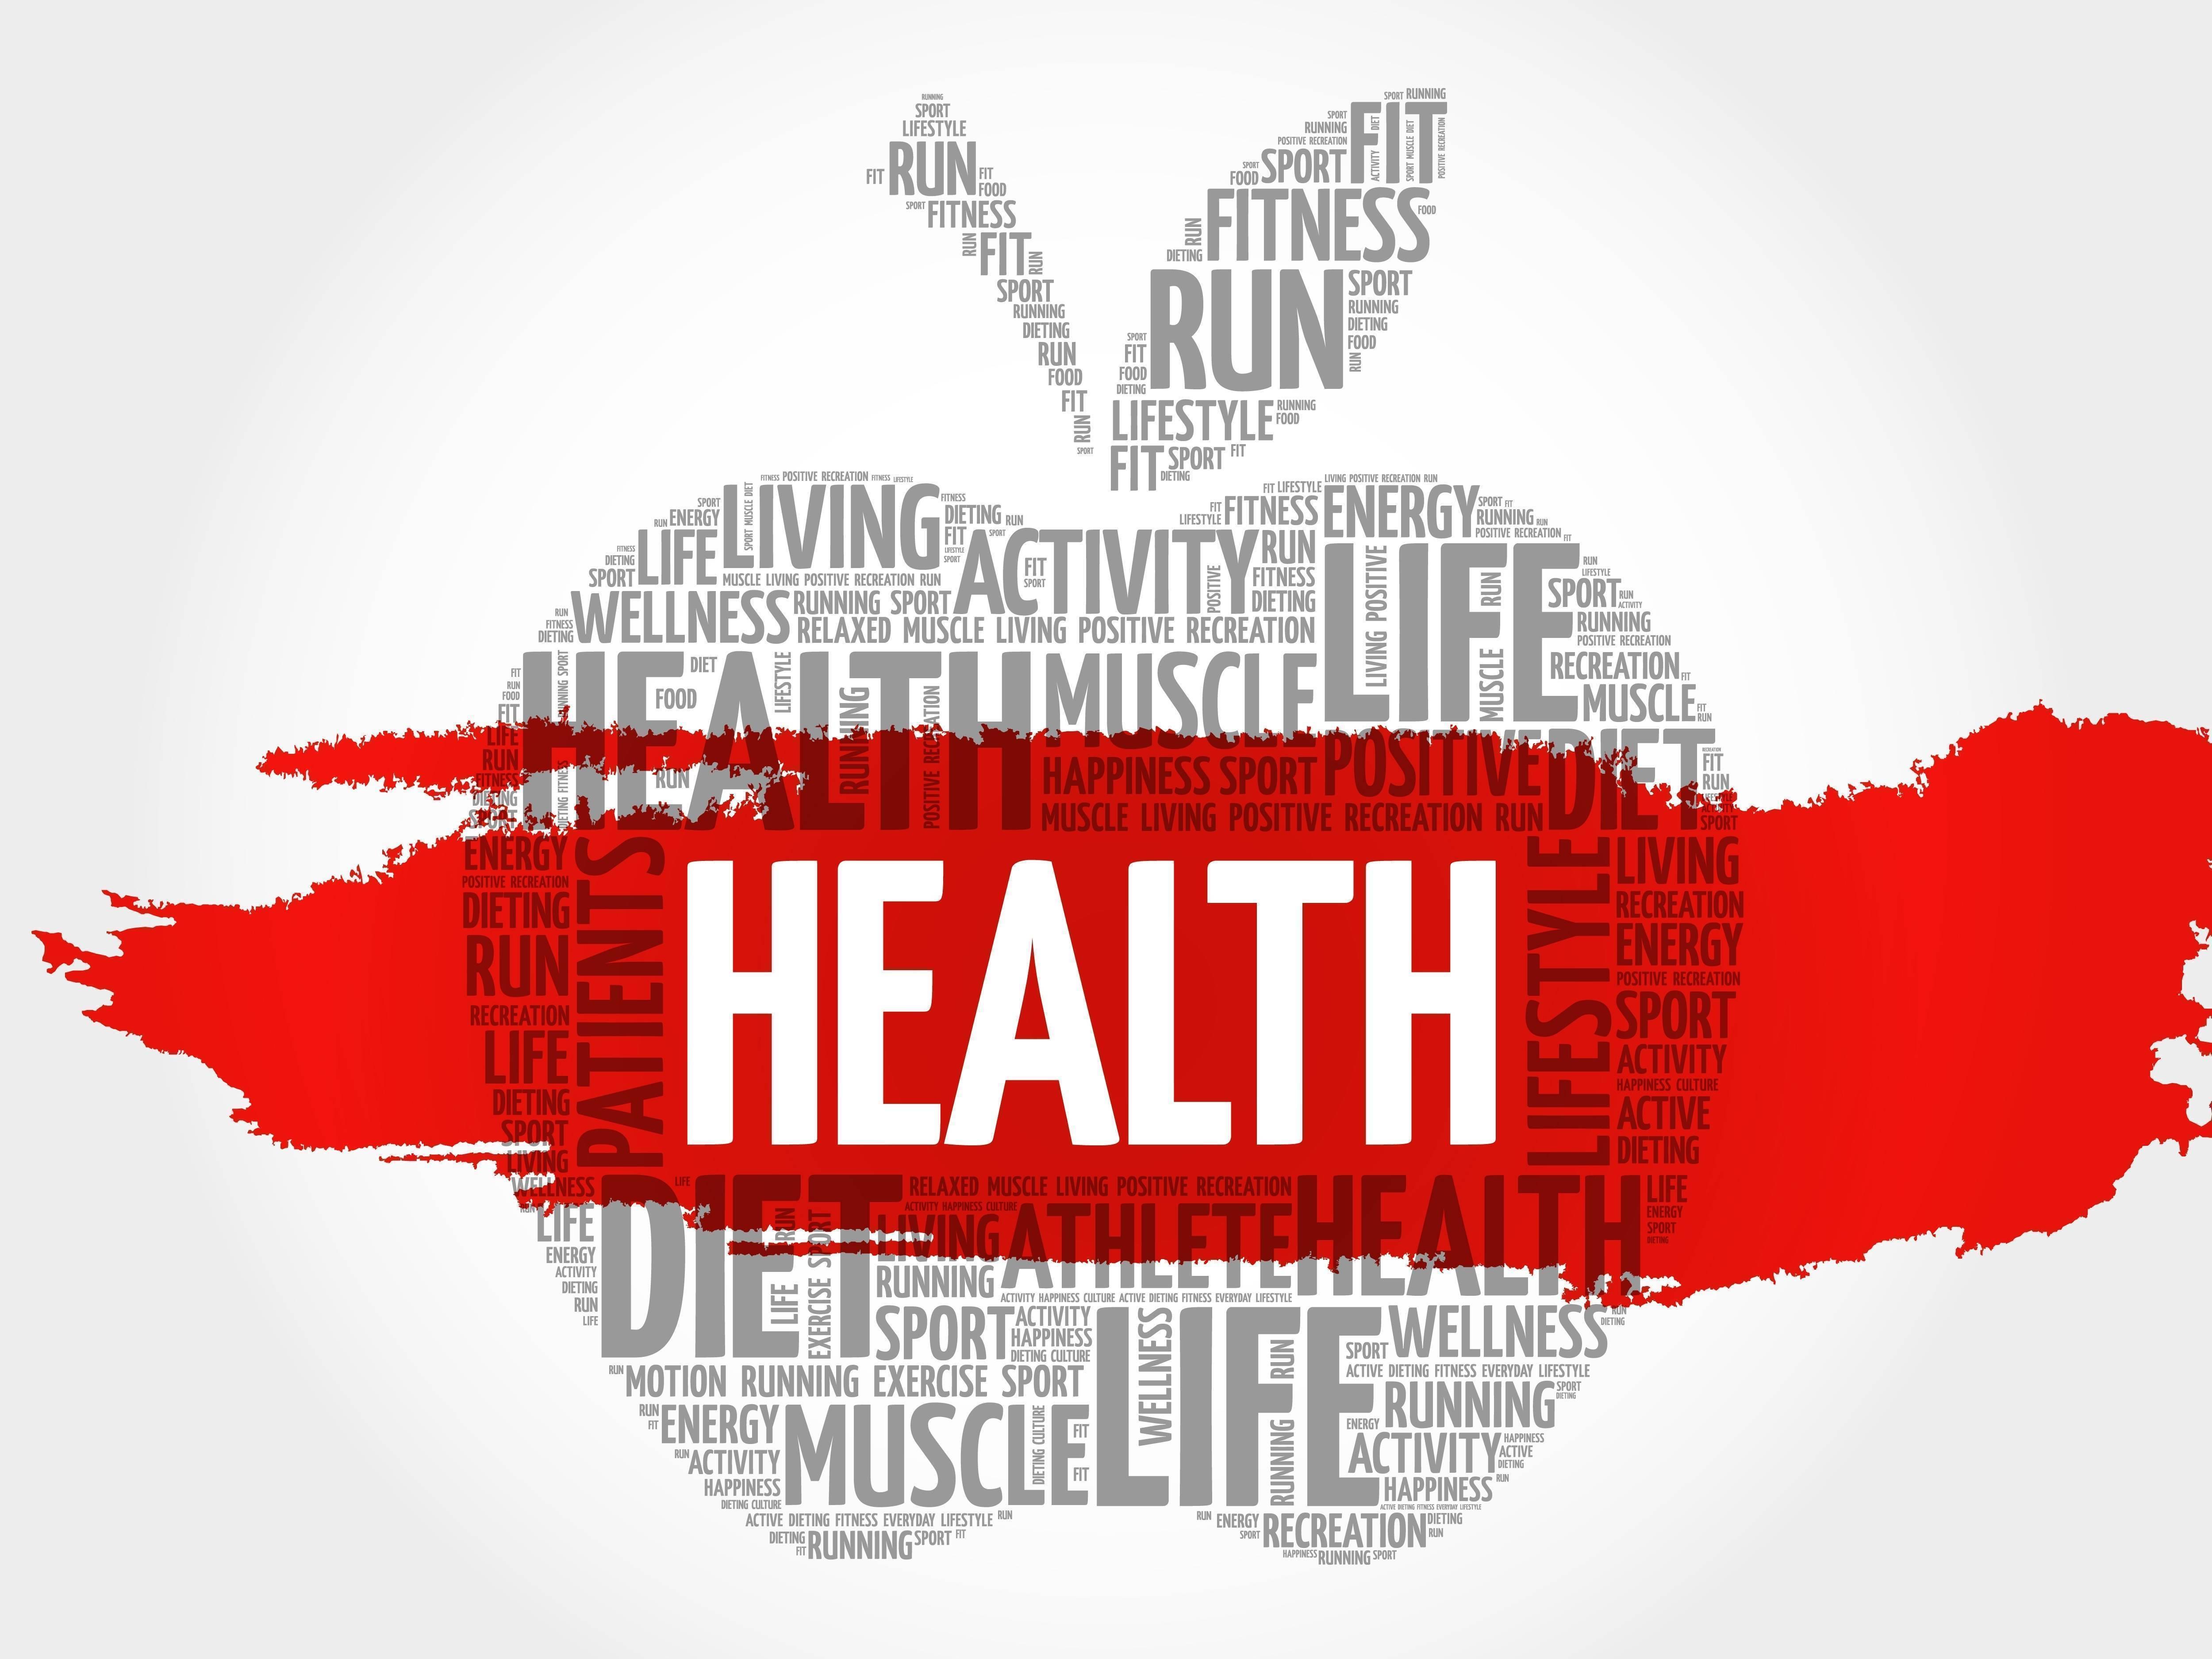 Register Today for Health Screening Program at Montville Township Health Department